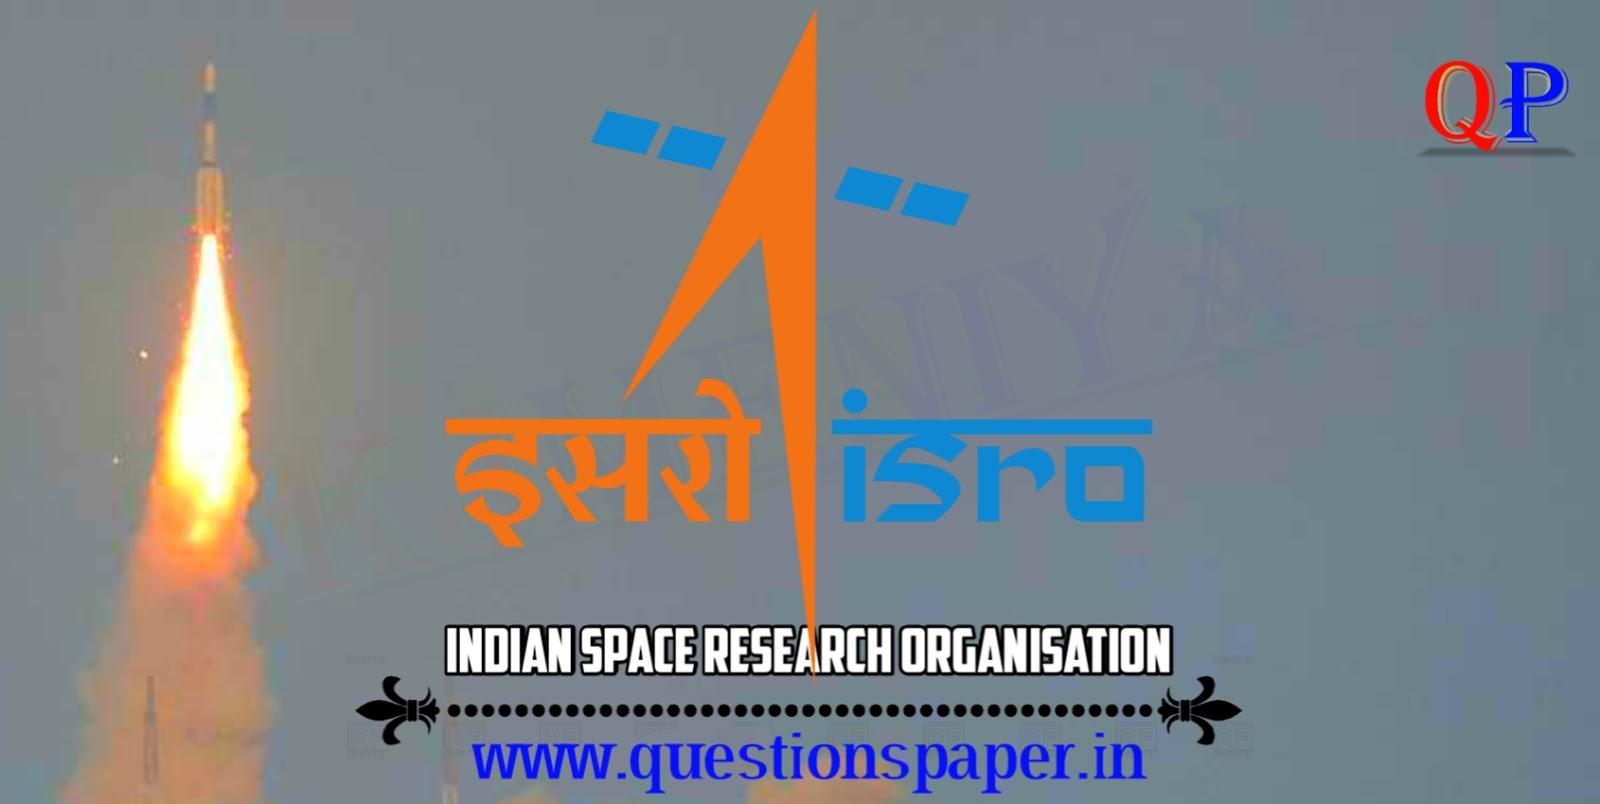 ISRO Scientist/Engineer 'SC' (CEPO) – 2019 Question Paper (10-03-2019)